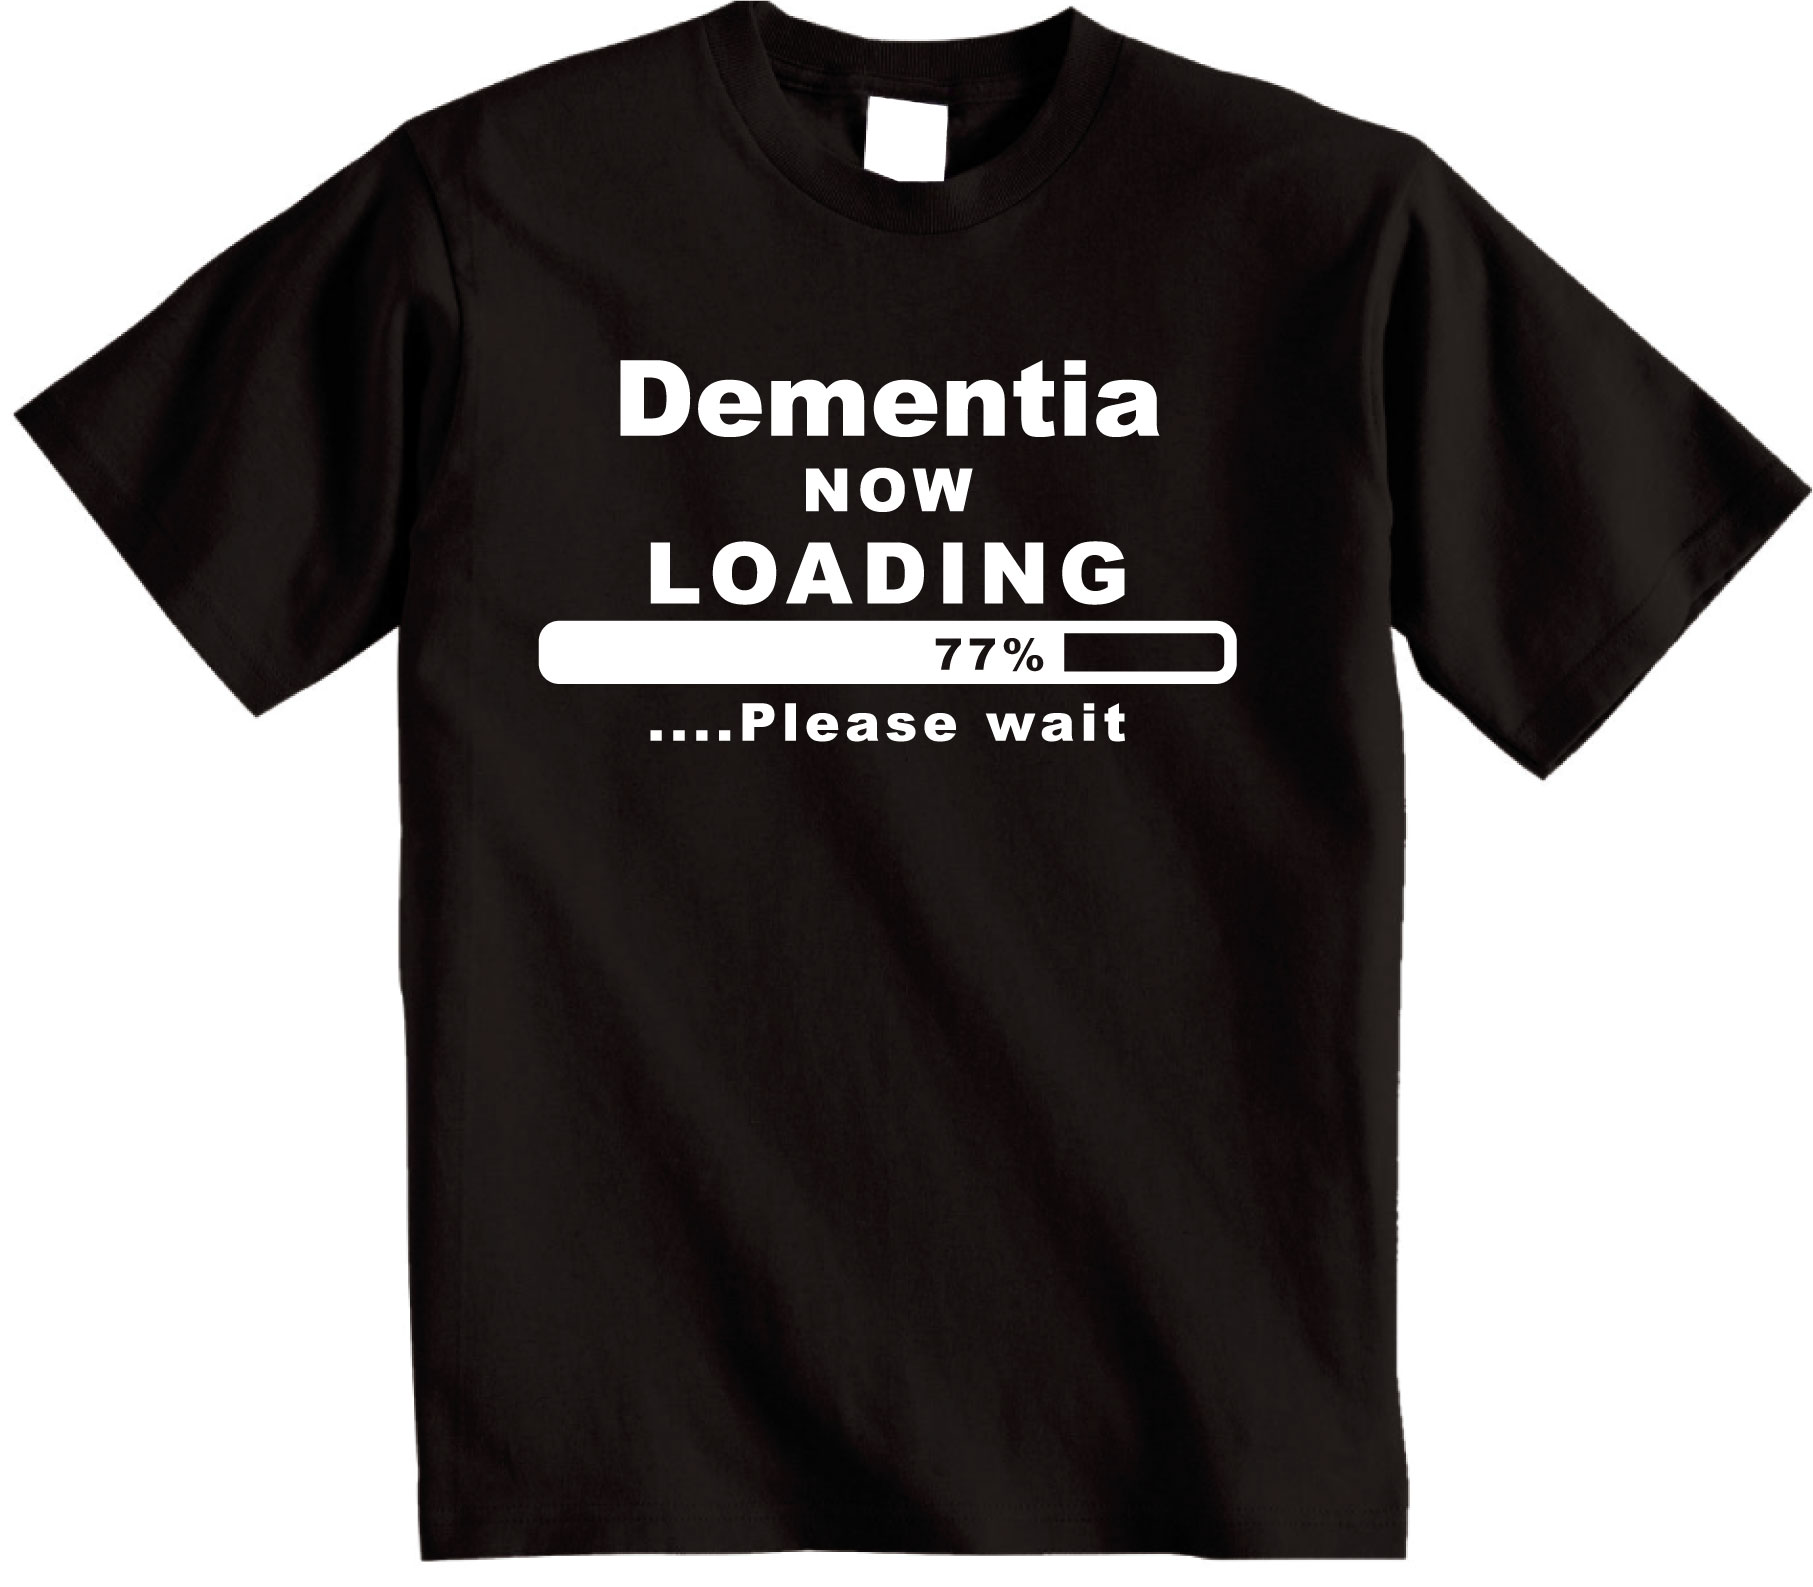 Dementia Now Loading Please Wait T-Shirt Novelty Bad Memory Tshirt from Shoebob